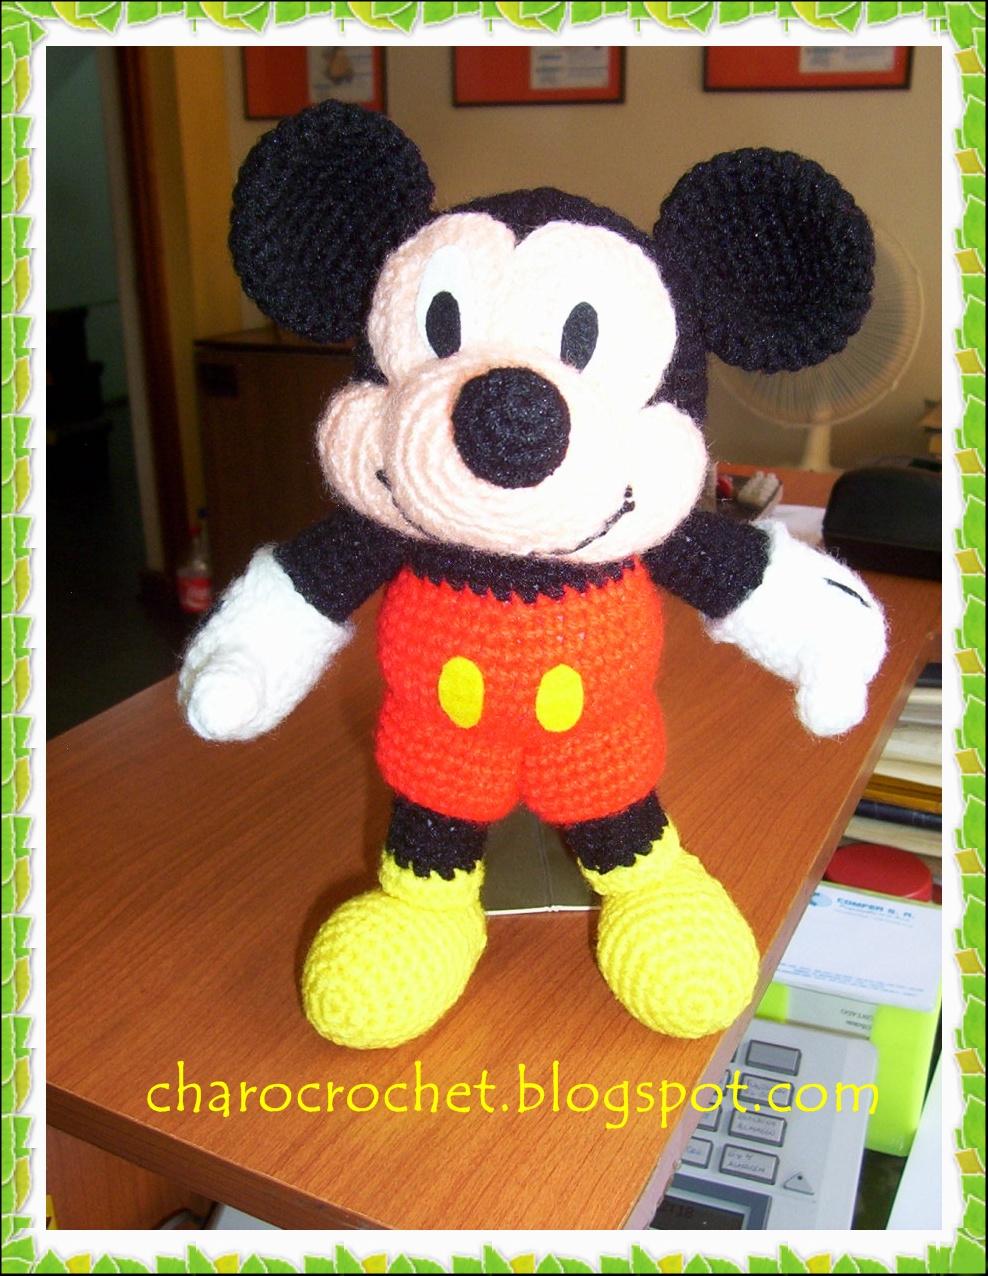 CHAROCROCHET PATRONES: MICKEY MOUSE